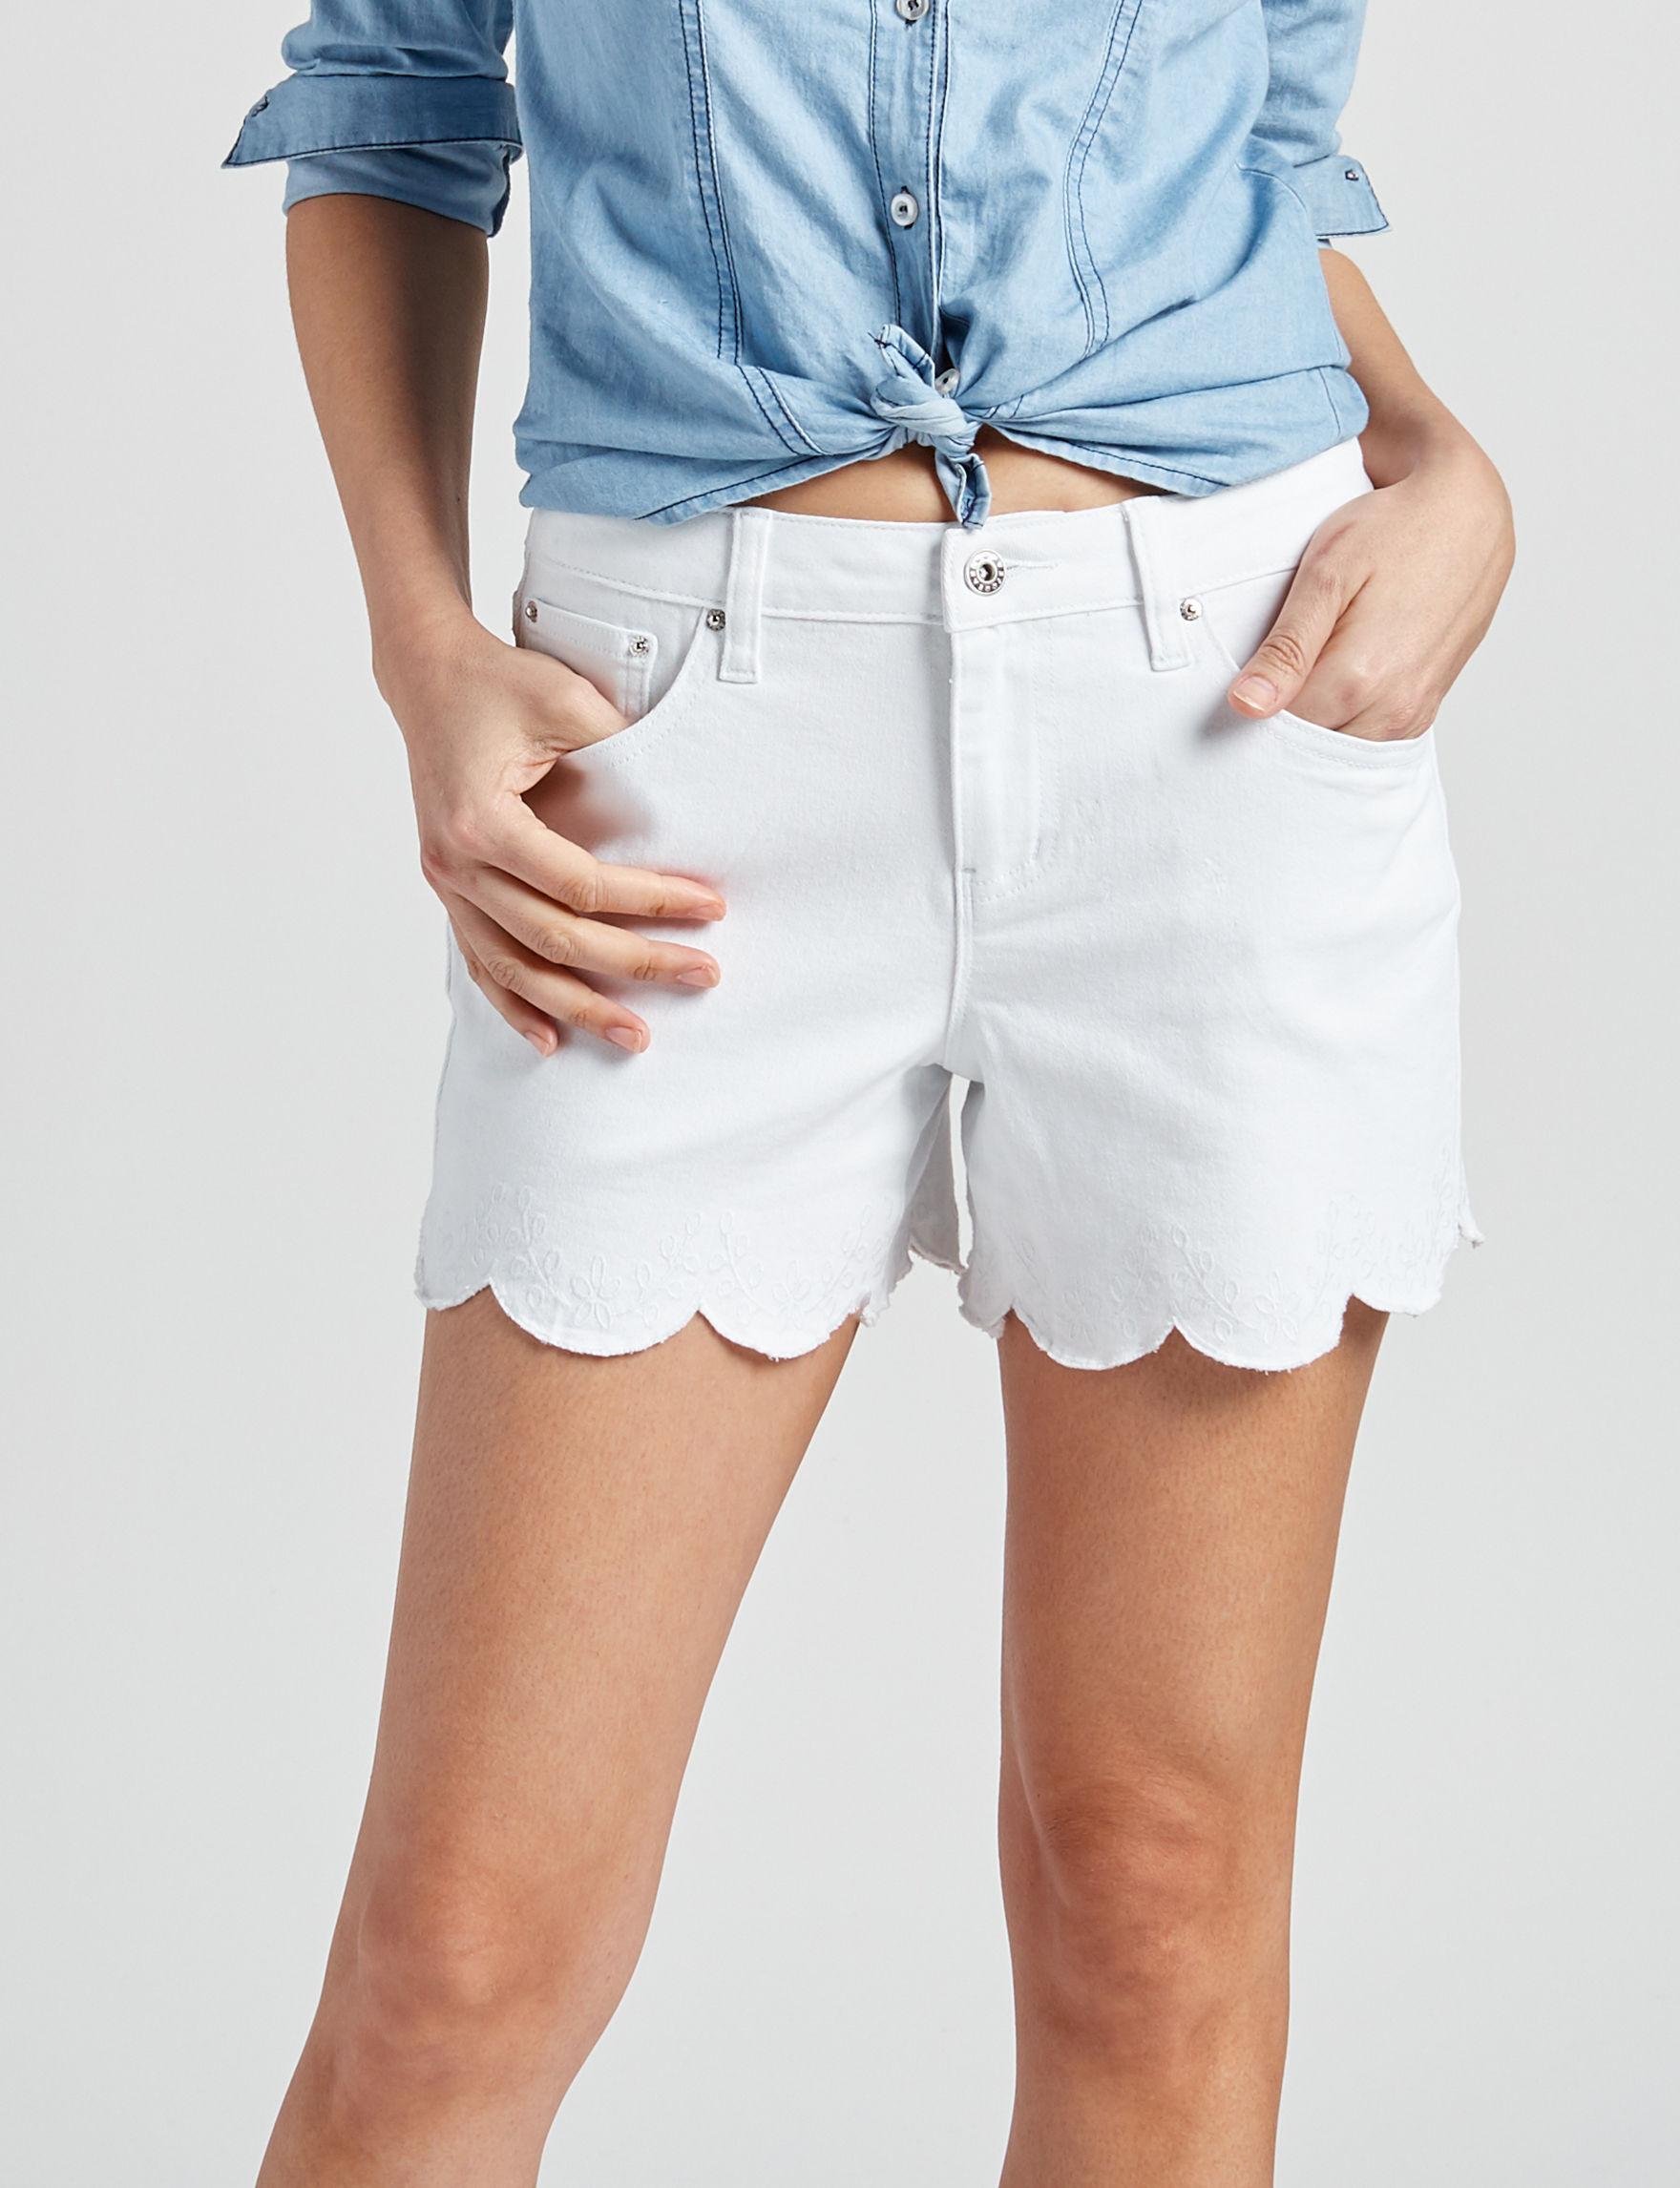 Earl Jean White Denim Shorts